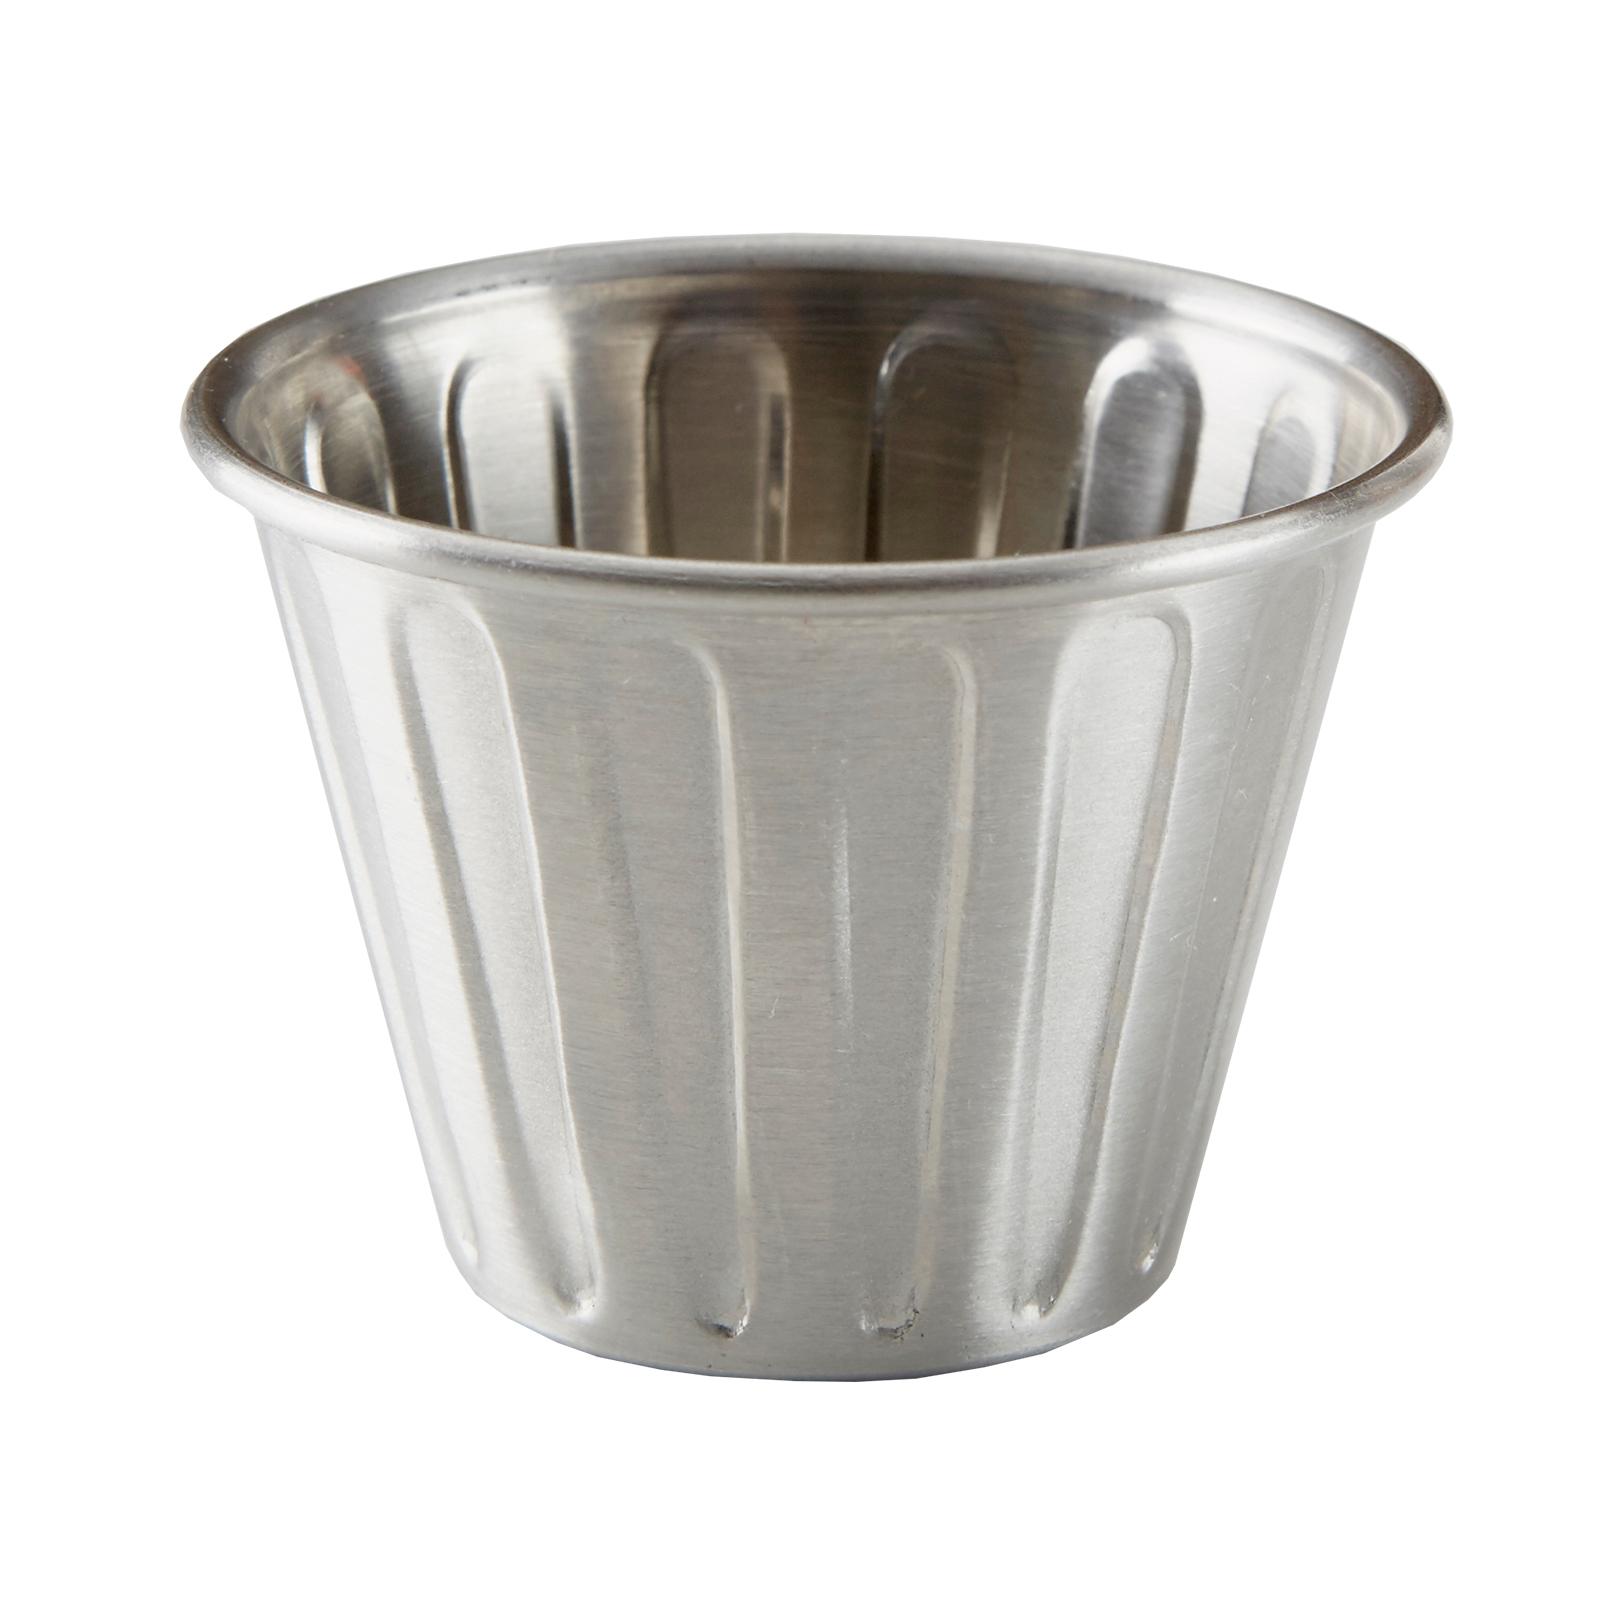 American Metalcraft RB25 ramekin / sauce cup, metal